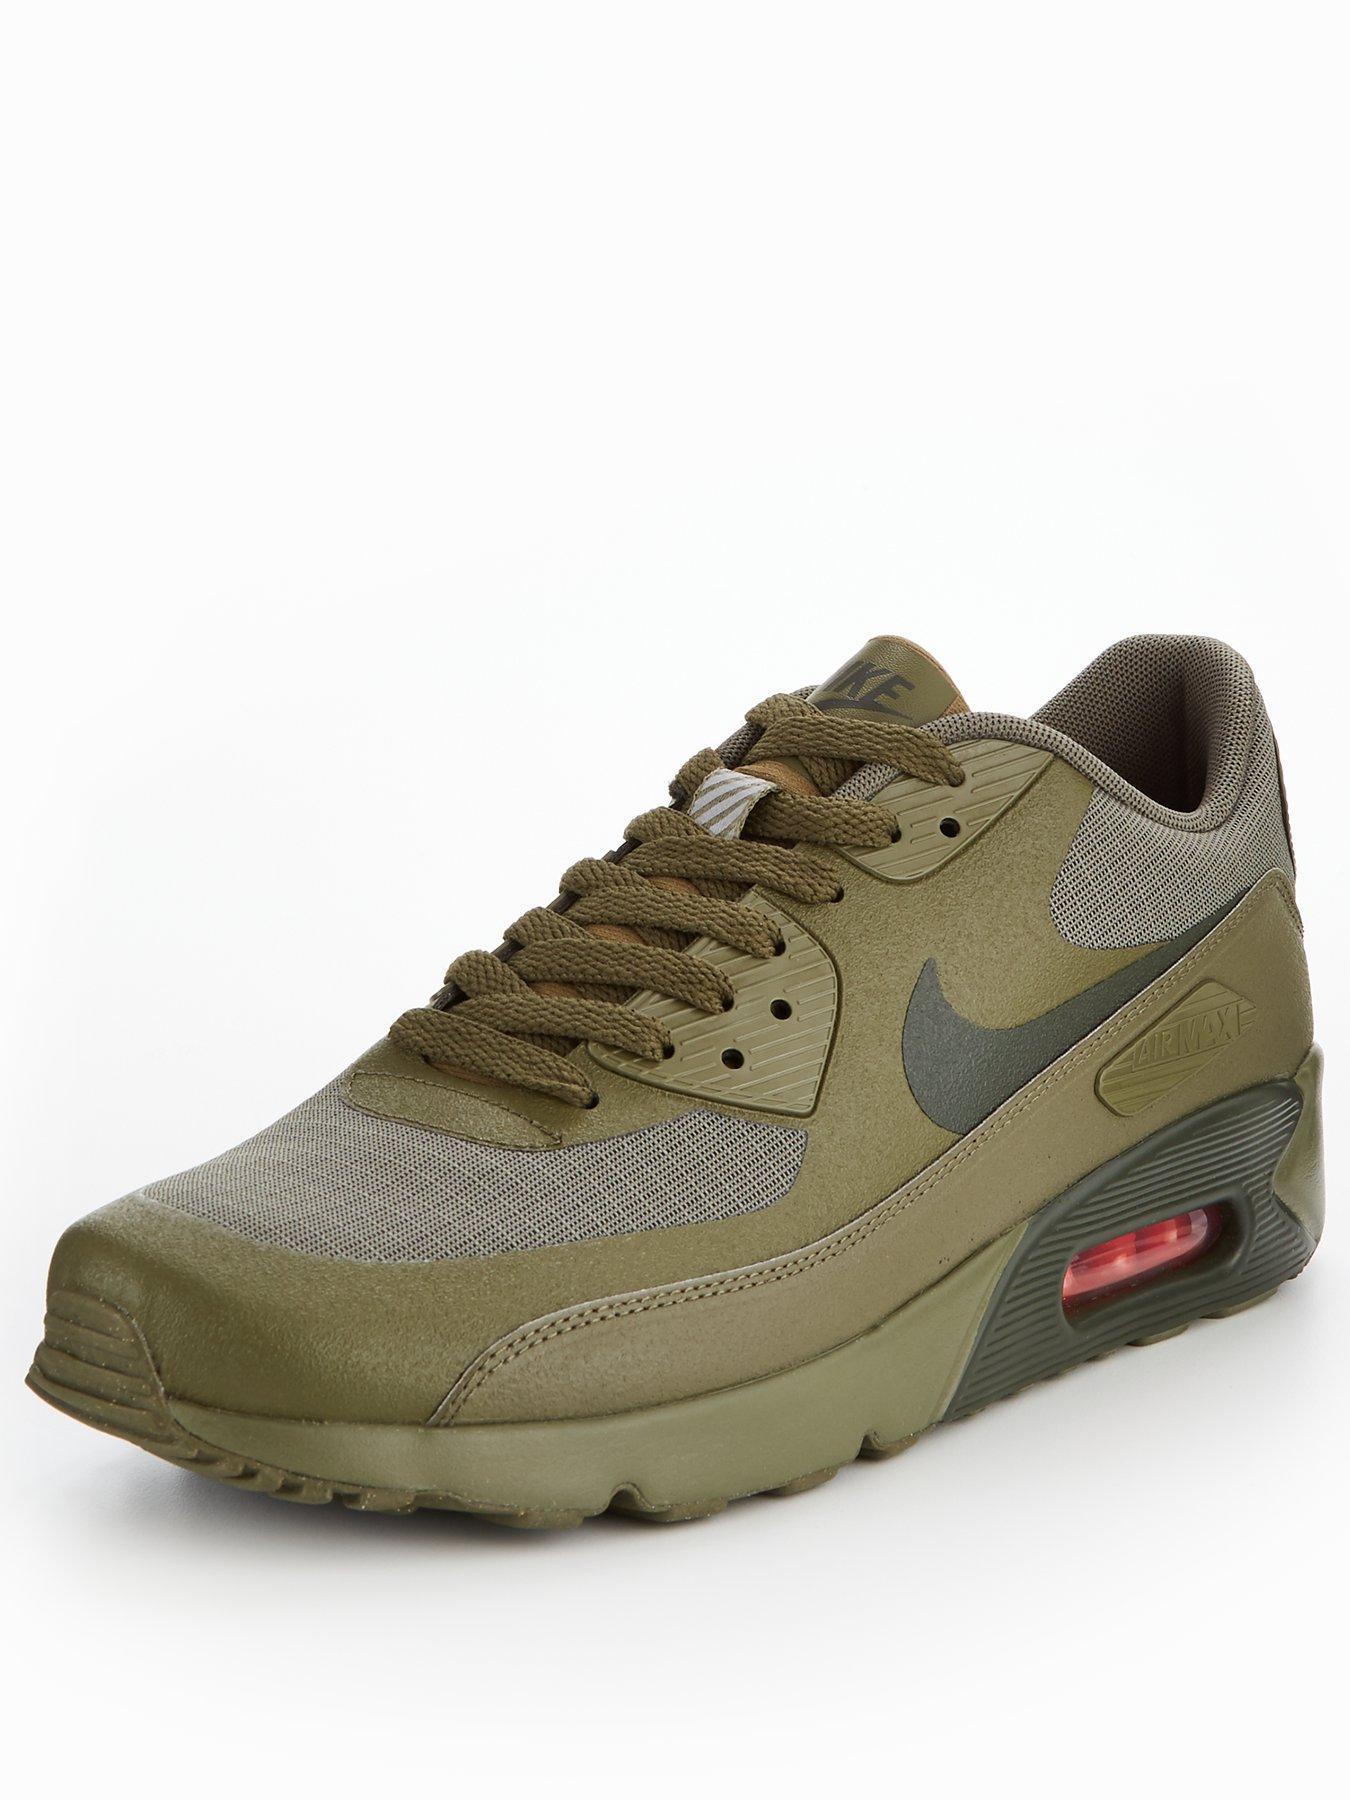 Hommes Nike Free 5.0 Formateur Siège Camo